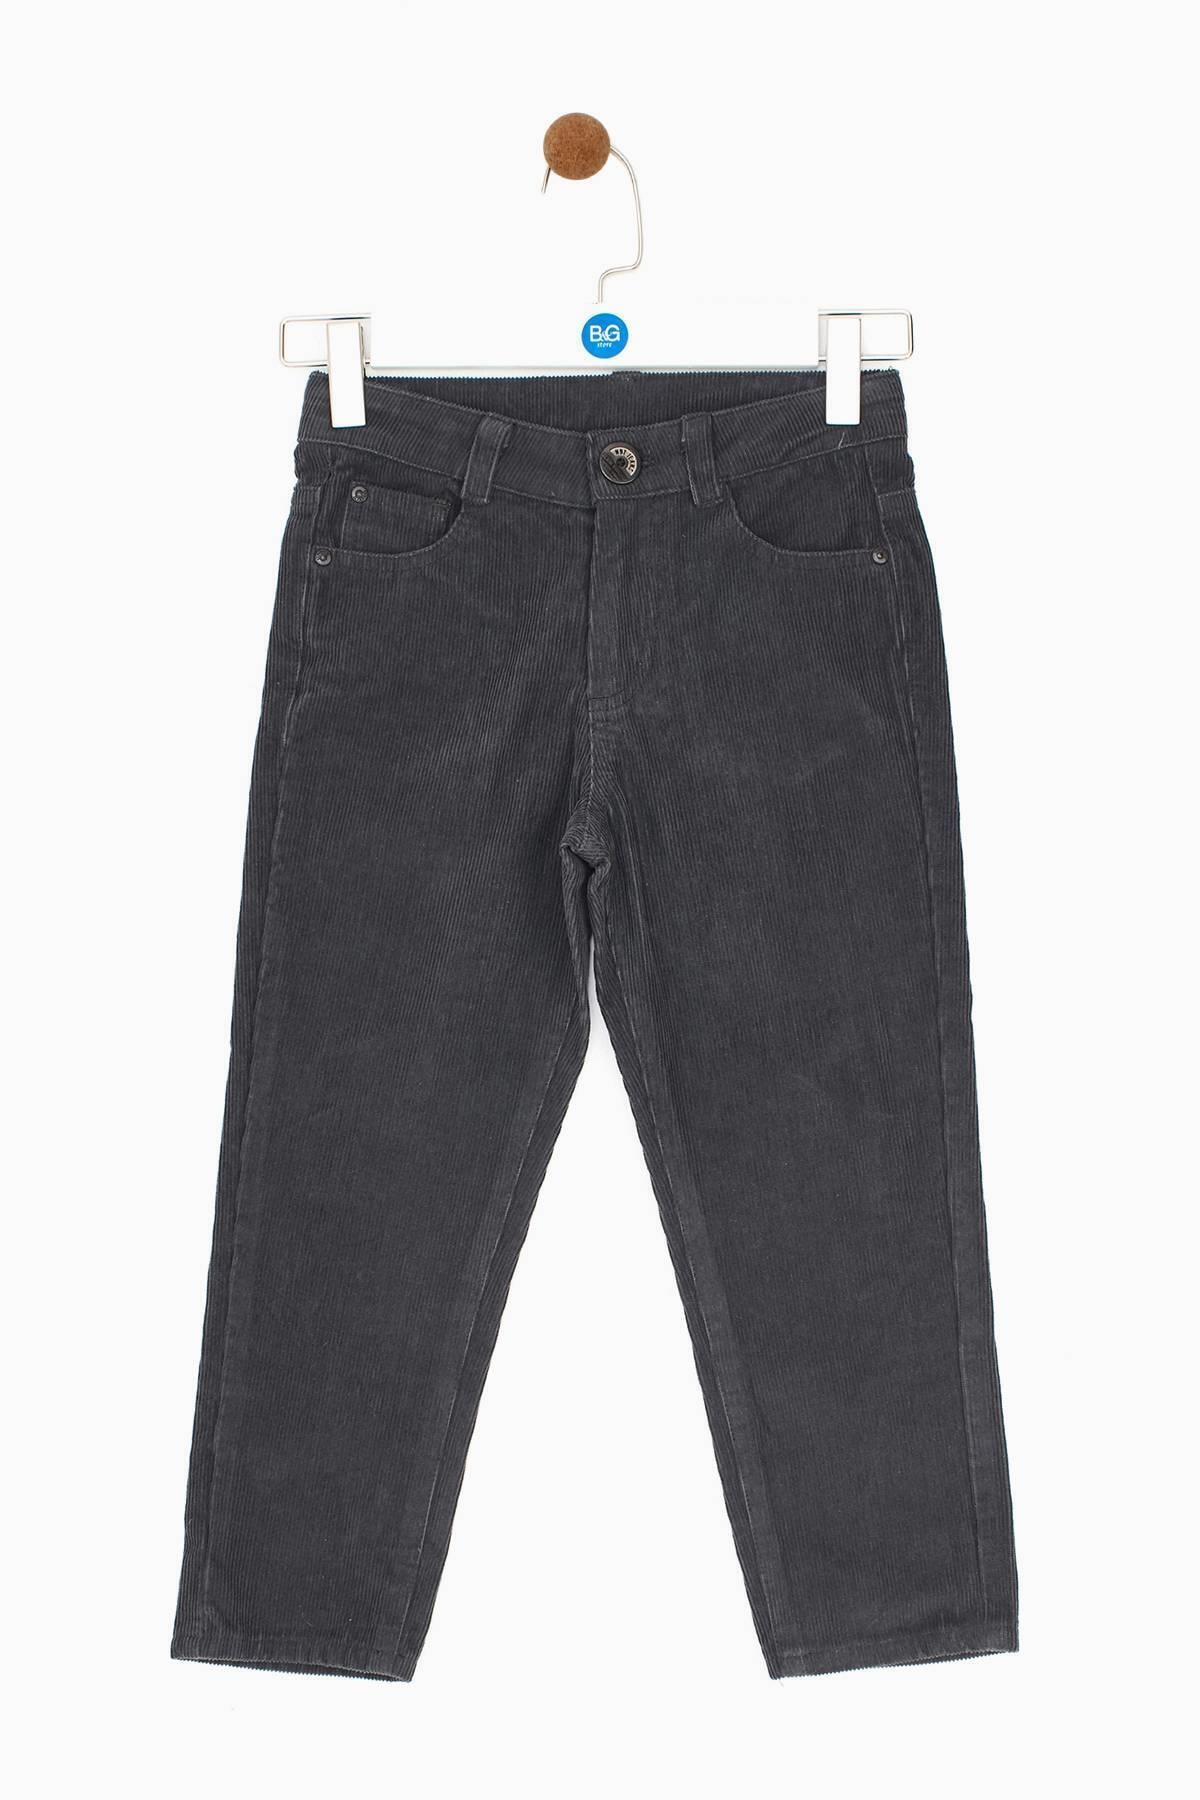 Nebbati Erkek Çocuk Siyah Pantolon 2